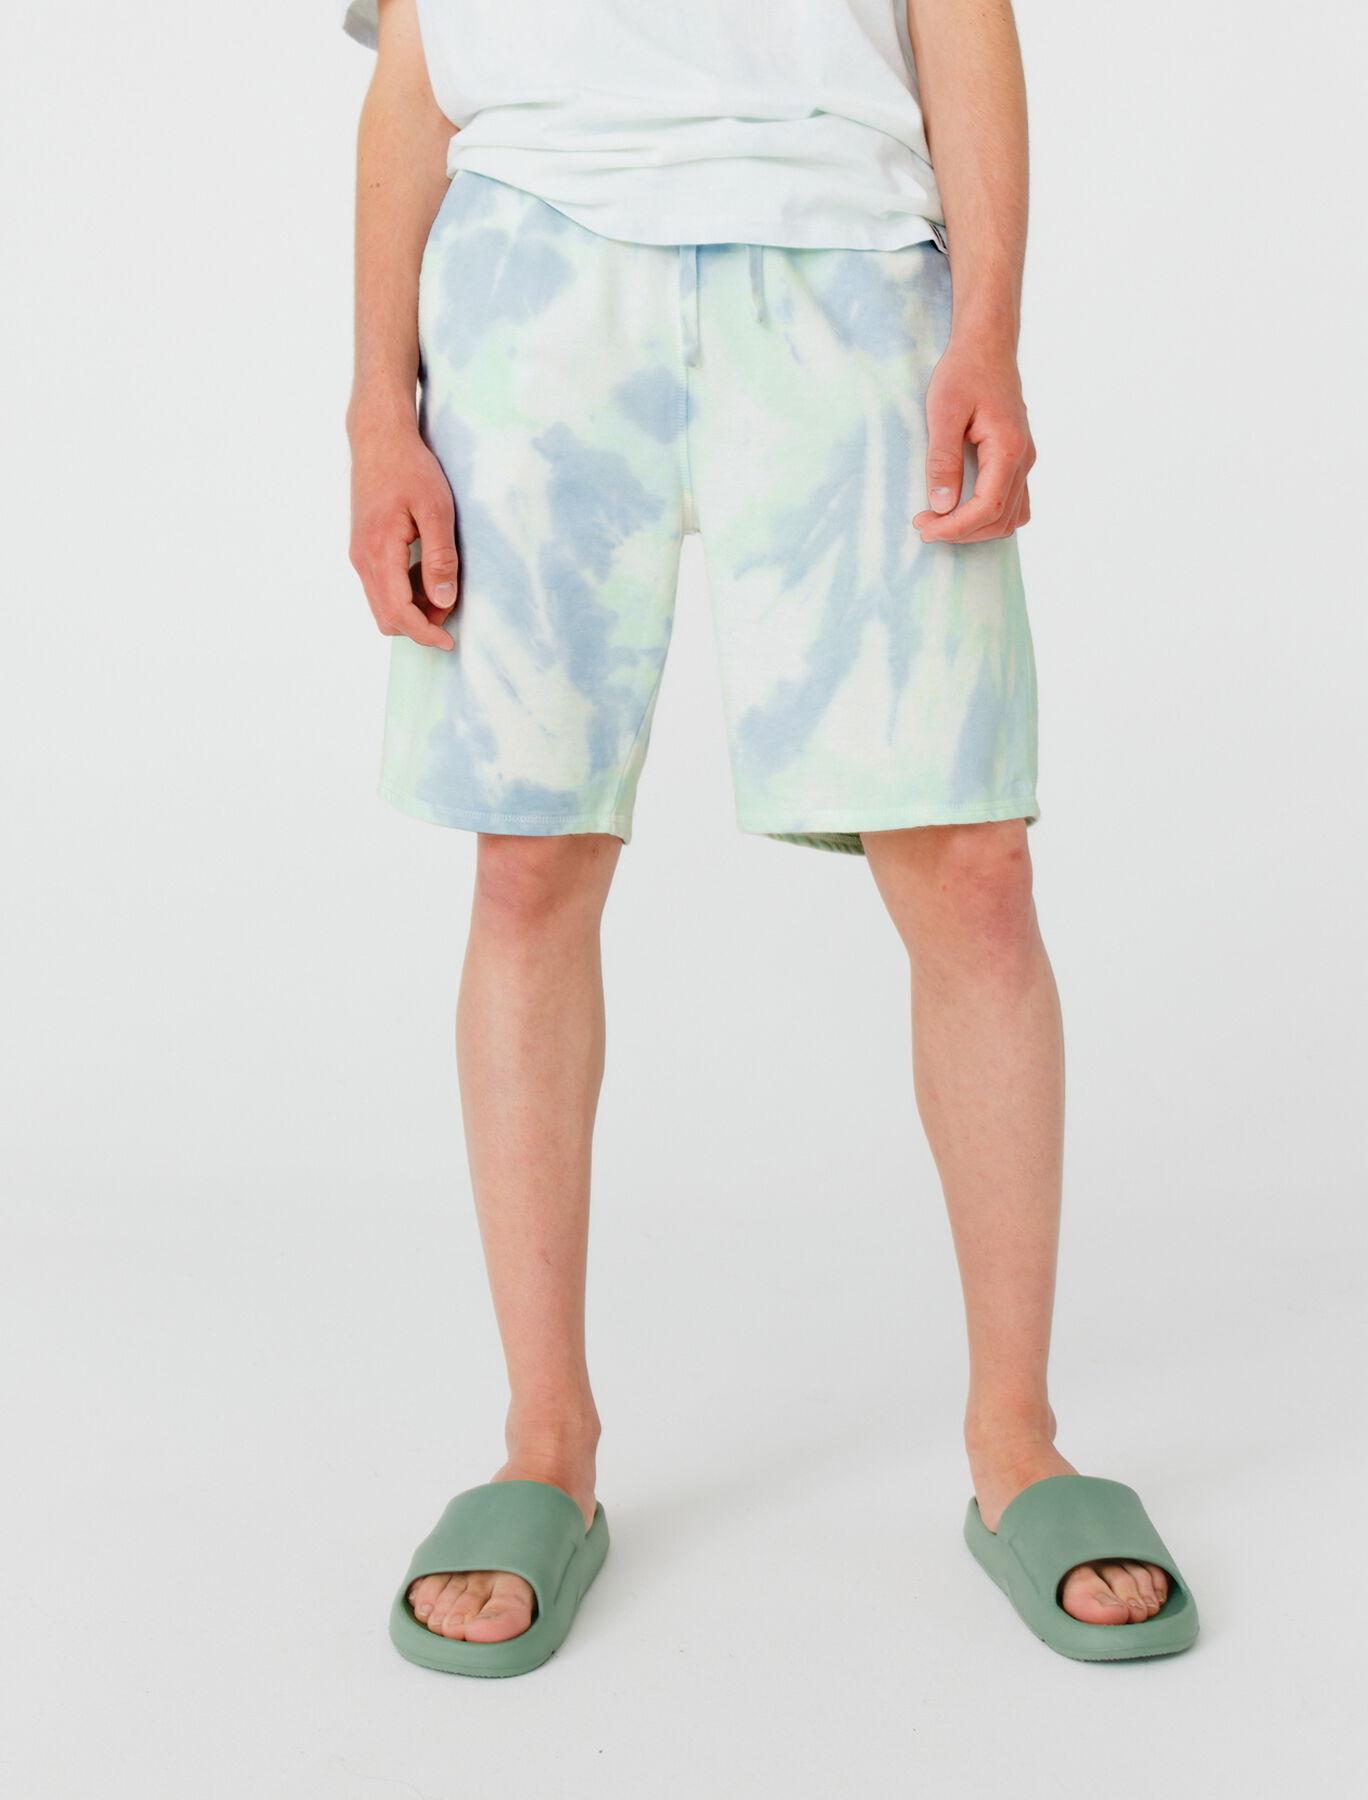 Bermuda Tie & Dye